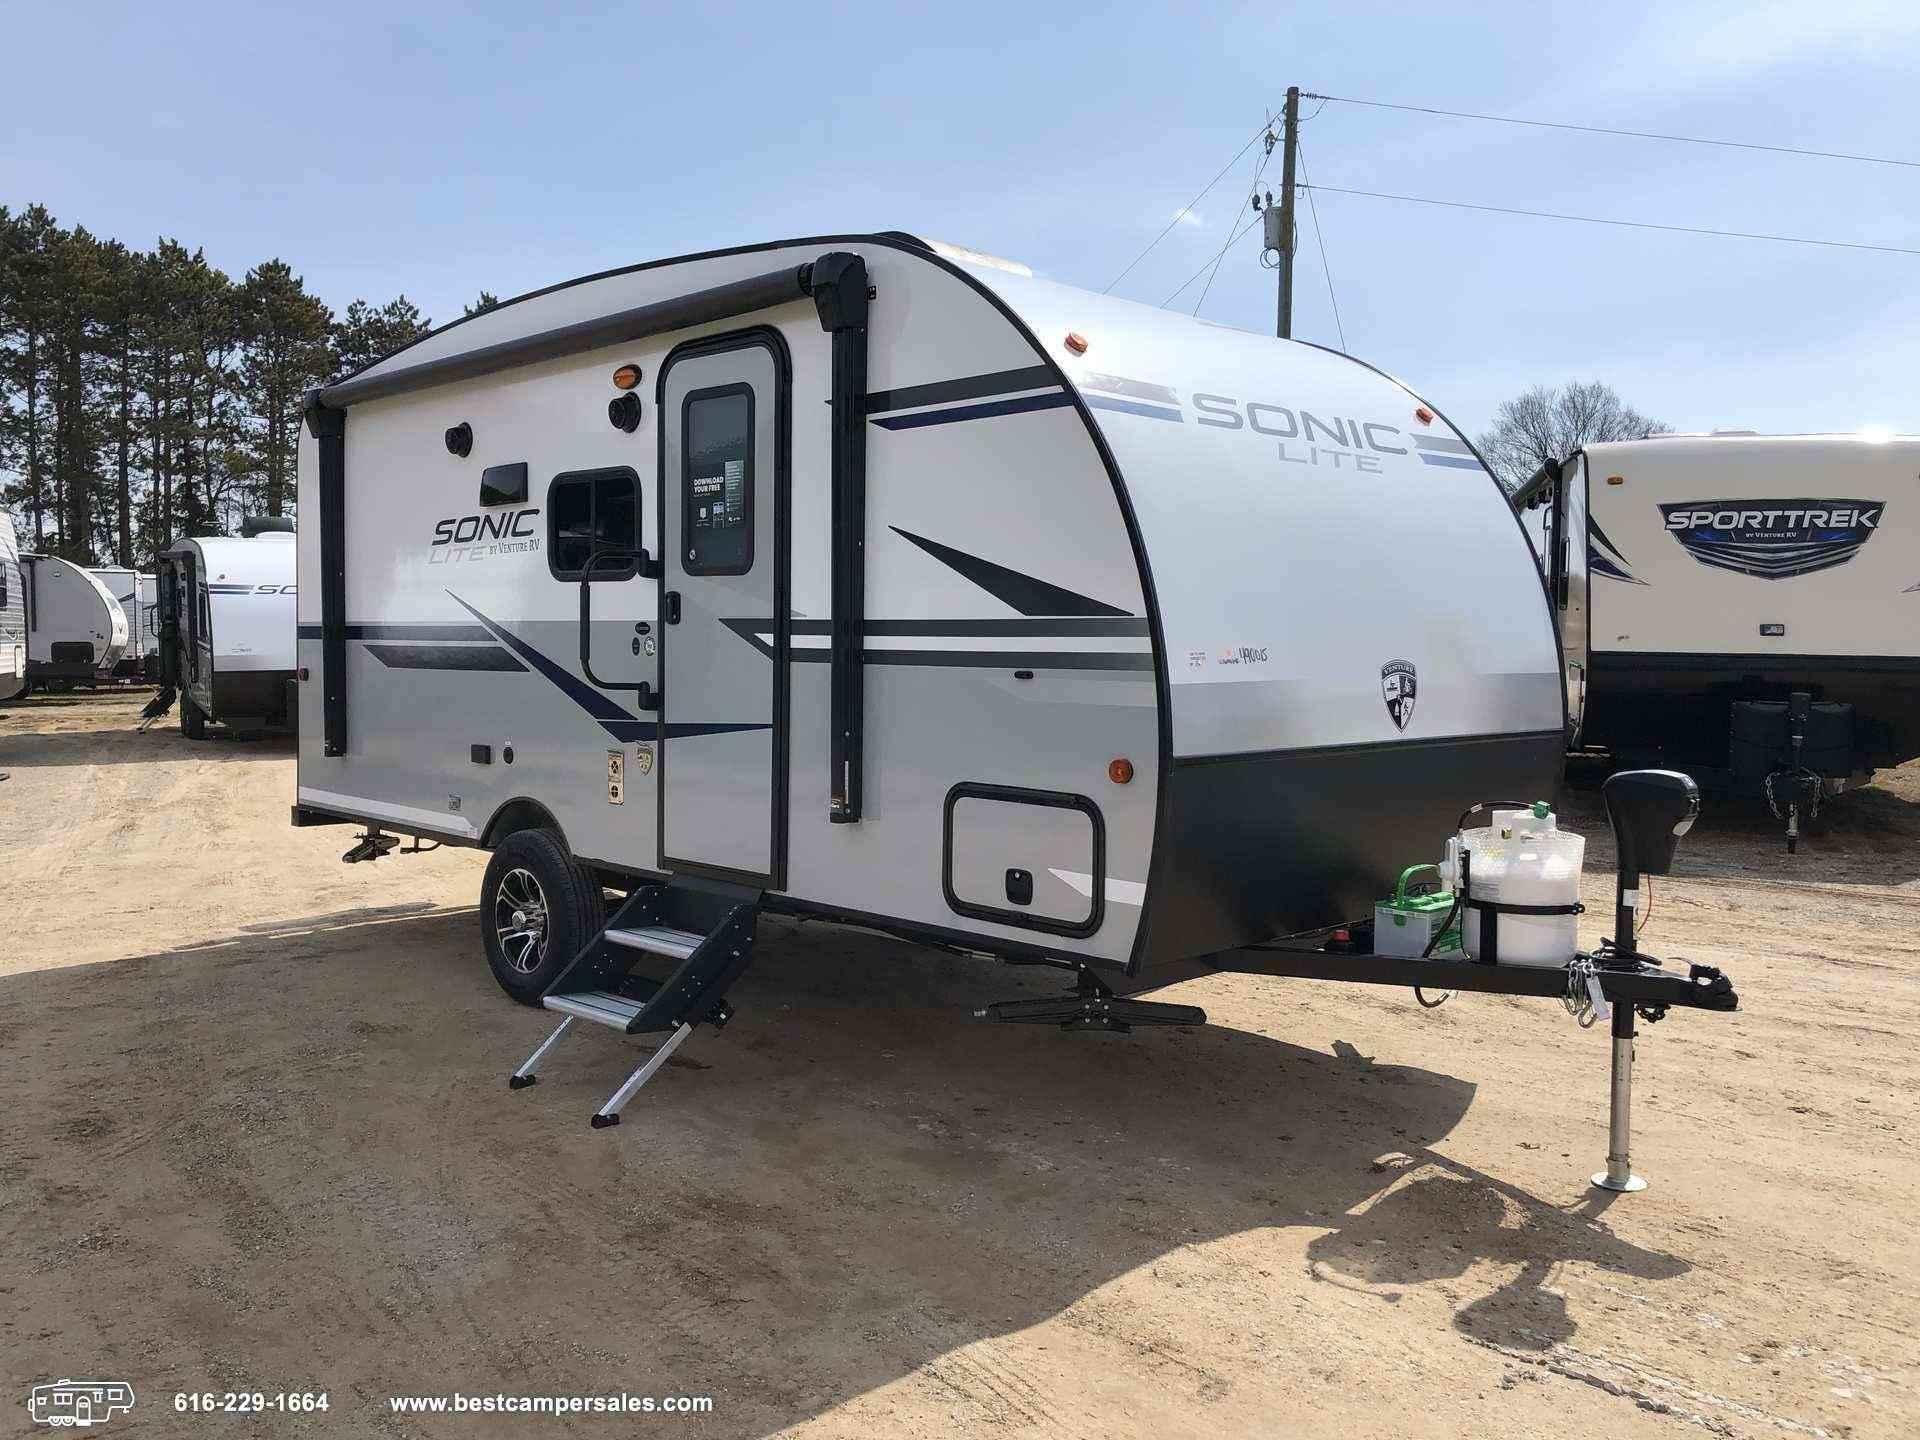 Best Rvs 2020 SONIC LITE 169VMK | Best Camper Sales